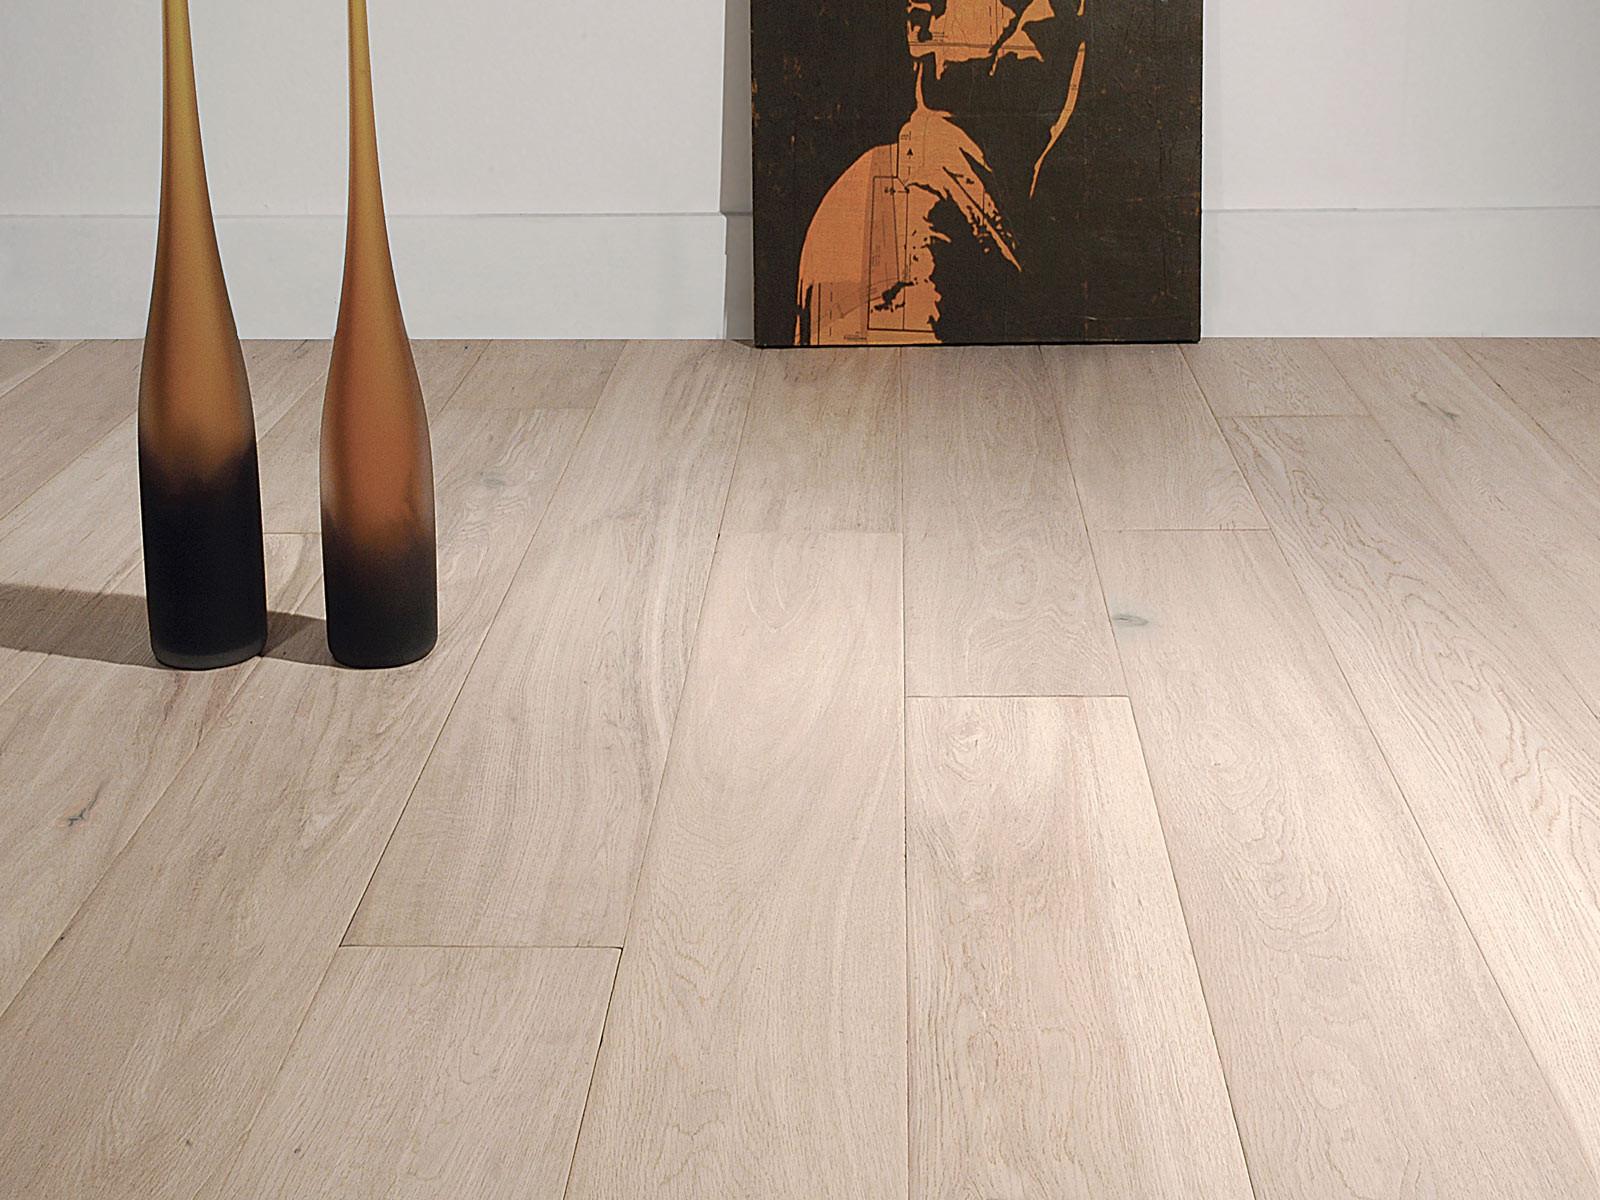 acacia walnut hardwood flooring review of provenza hardwood flooring houston tx discount premium wood floors intended for white oiled